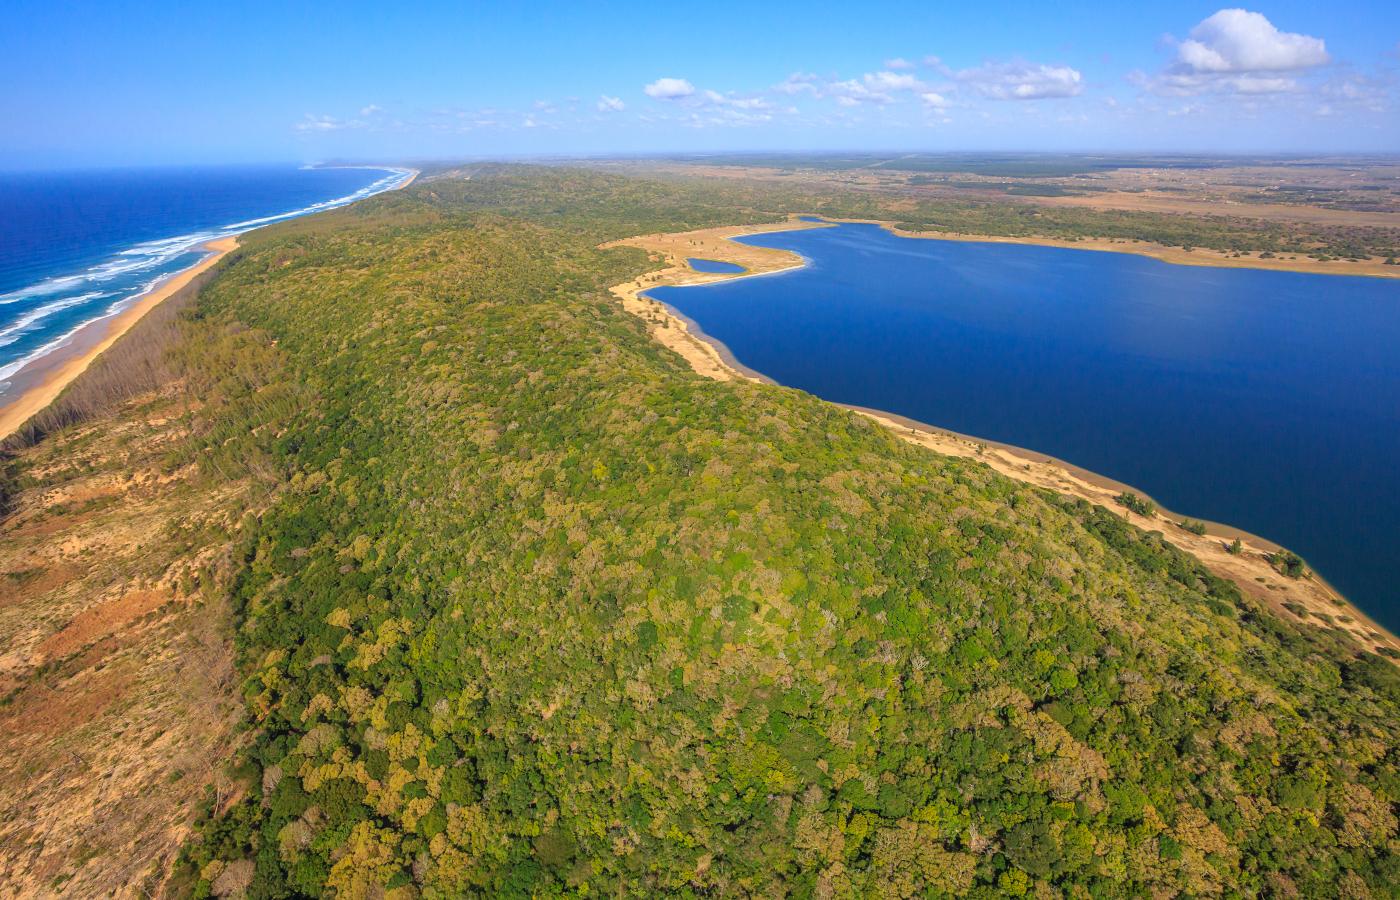 Südafrika & Swaziland - Abseits der Touristenpfade